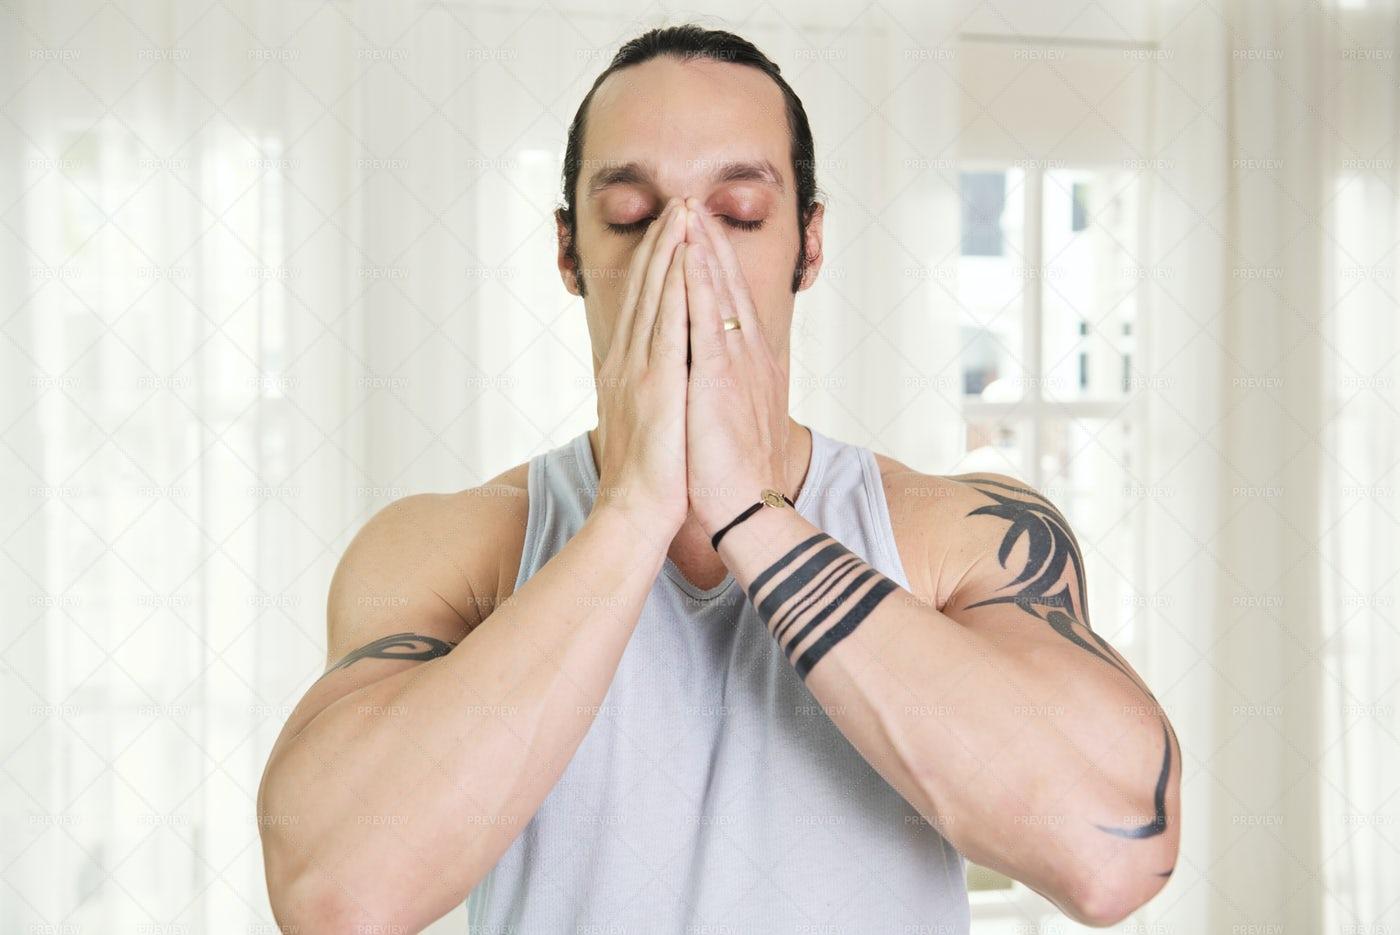 Man Almost Sneezing: Stock Photos